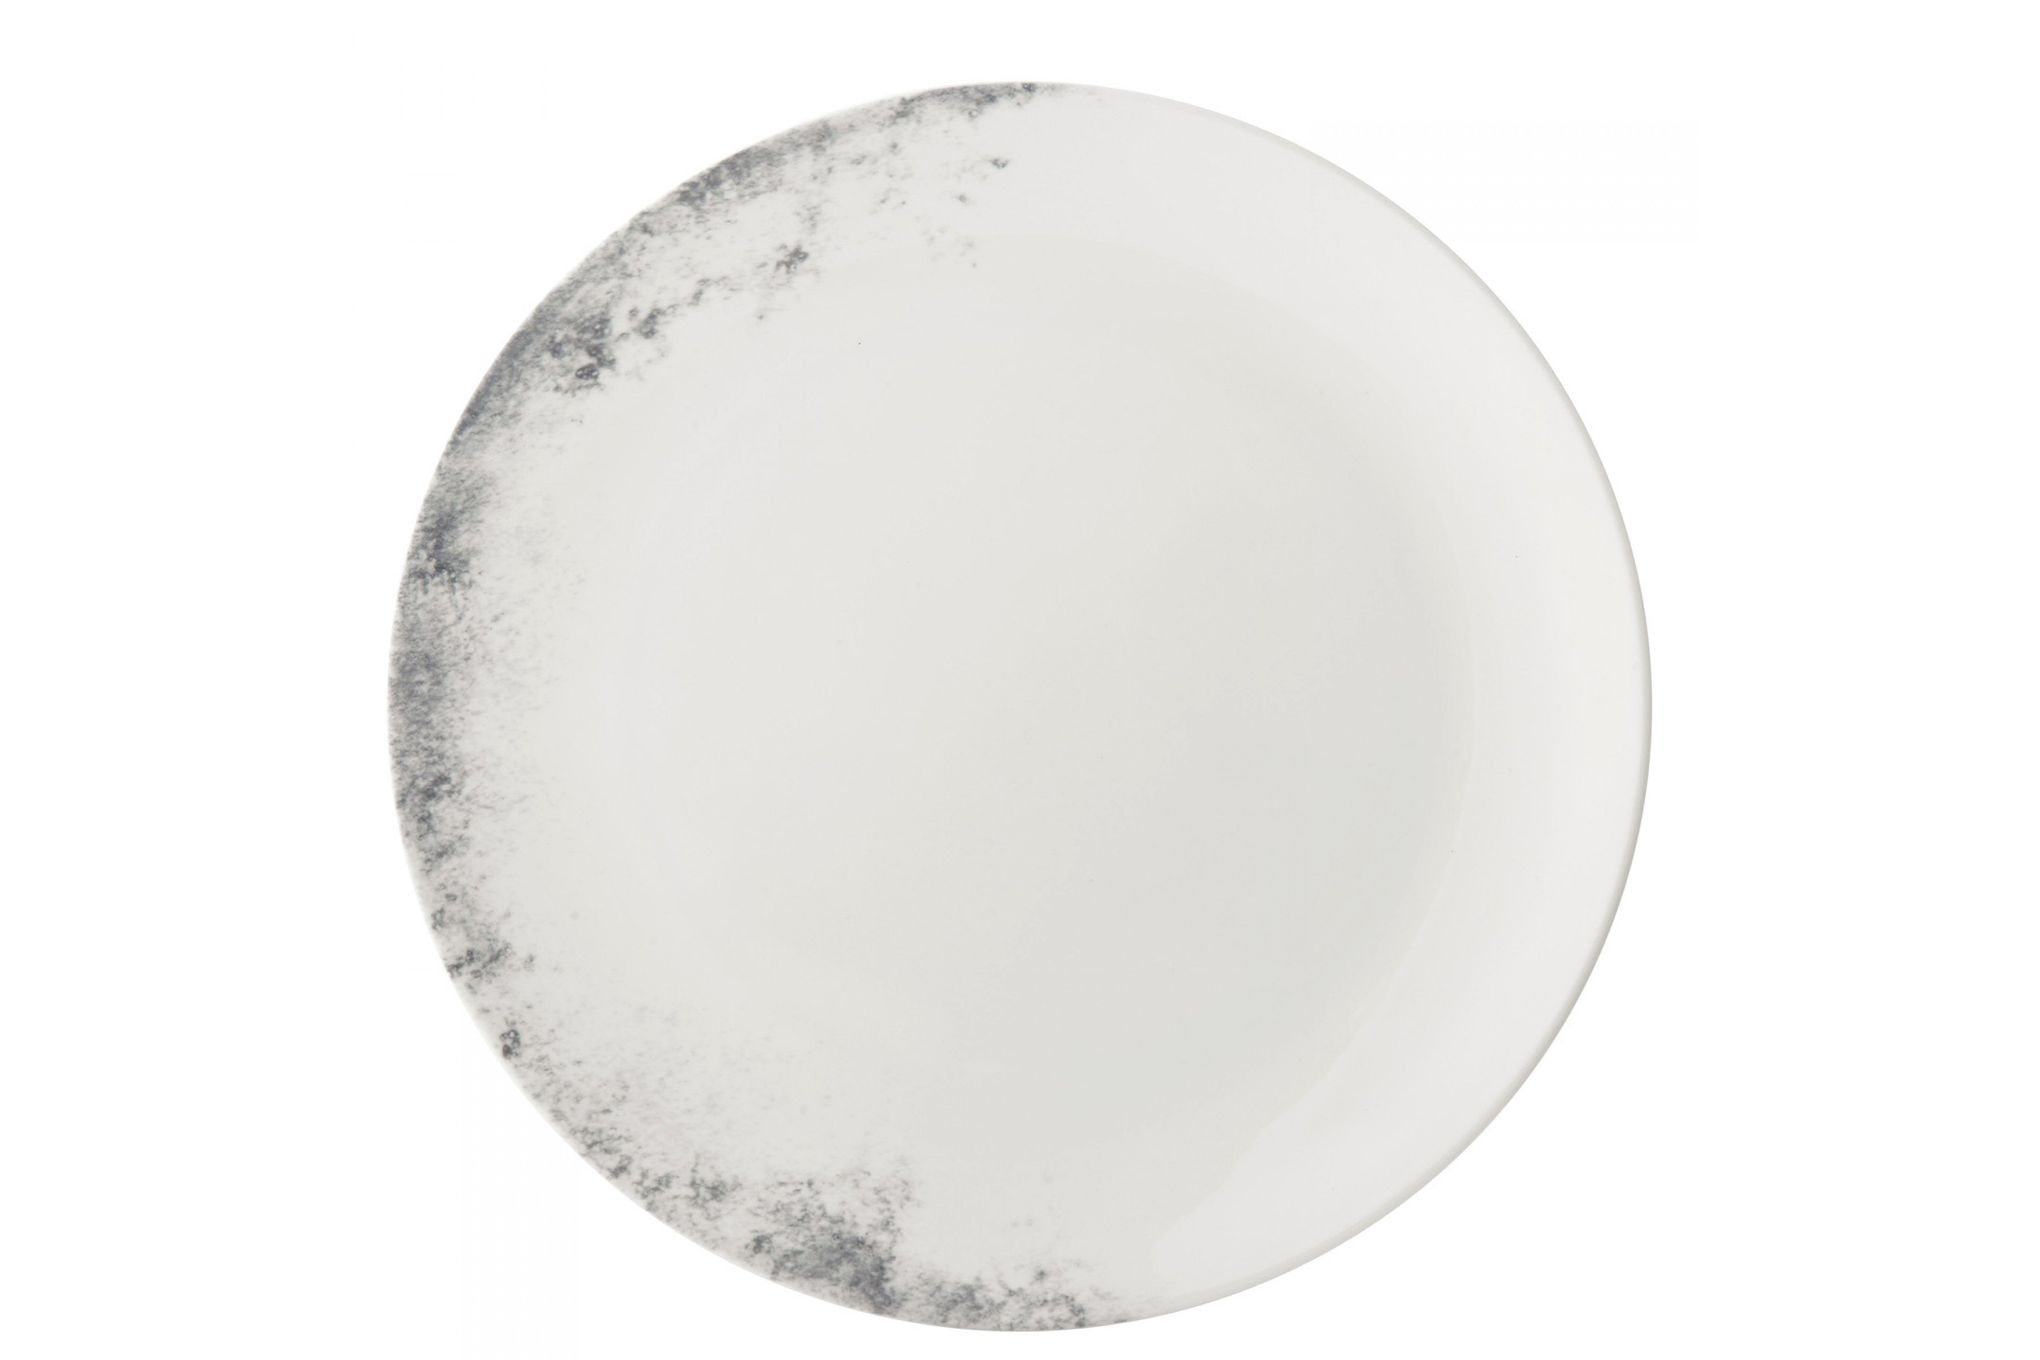 Vera Wang for Wedgwood Pointilliste Dinner Plate 28cm thumb 1